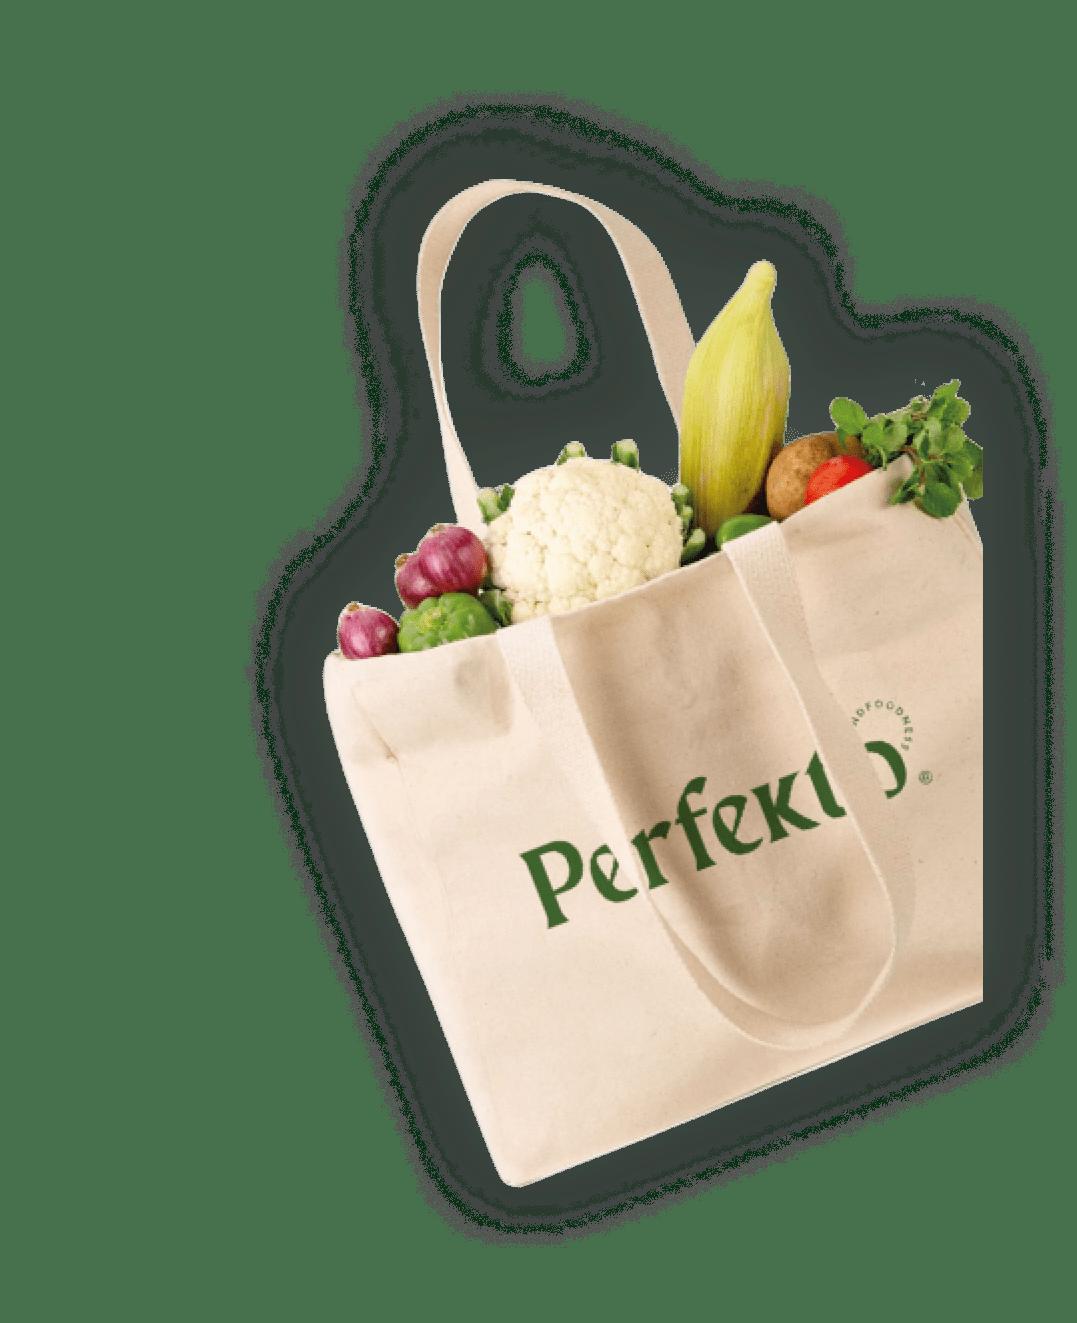 Perfekto Product Bag